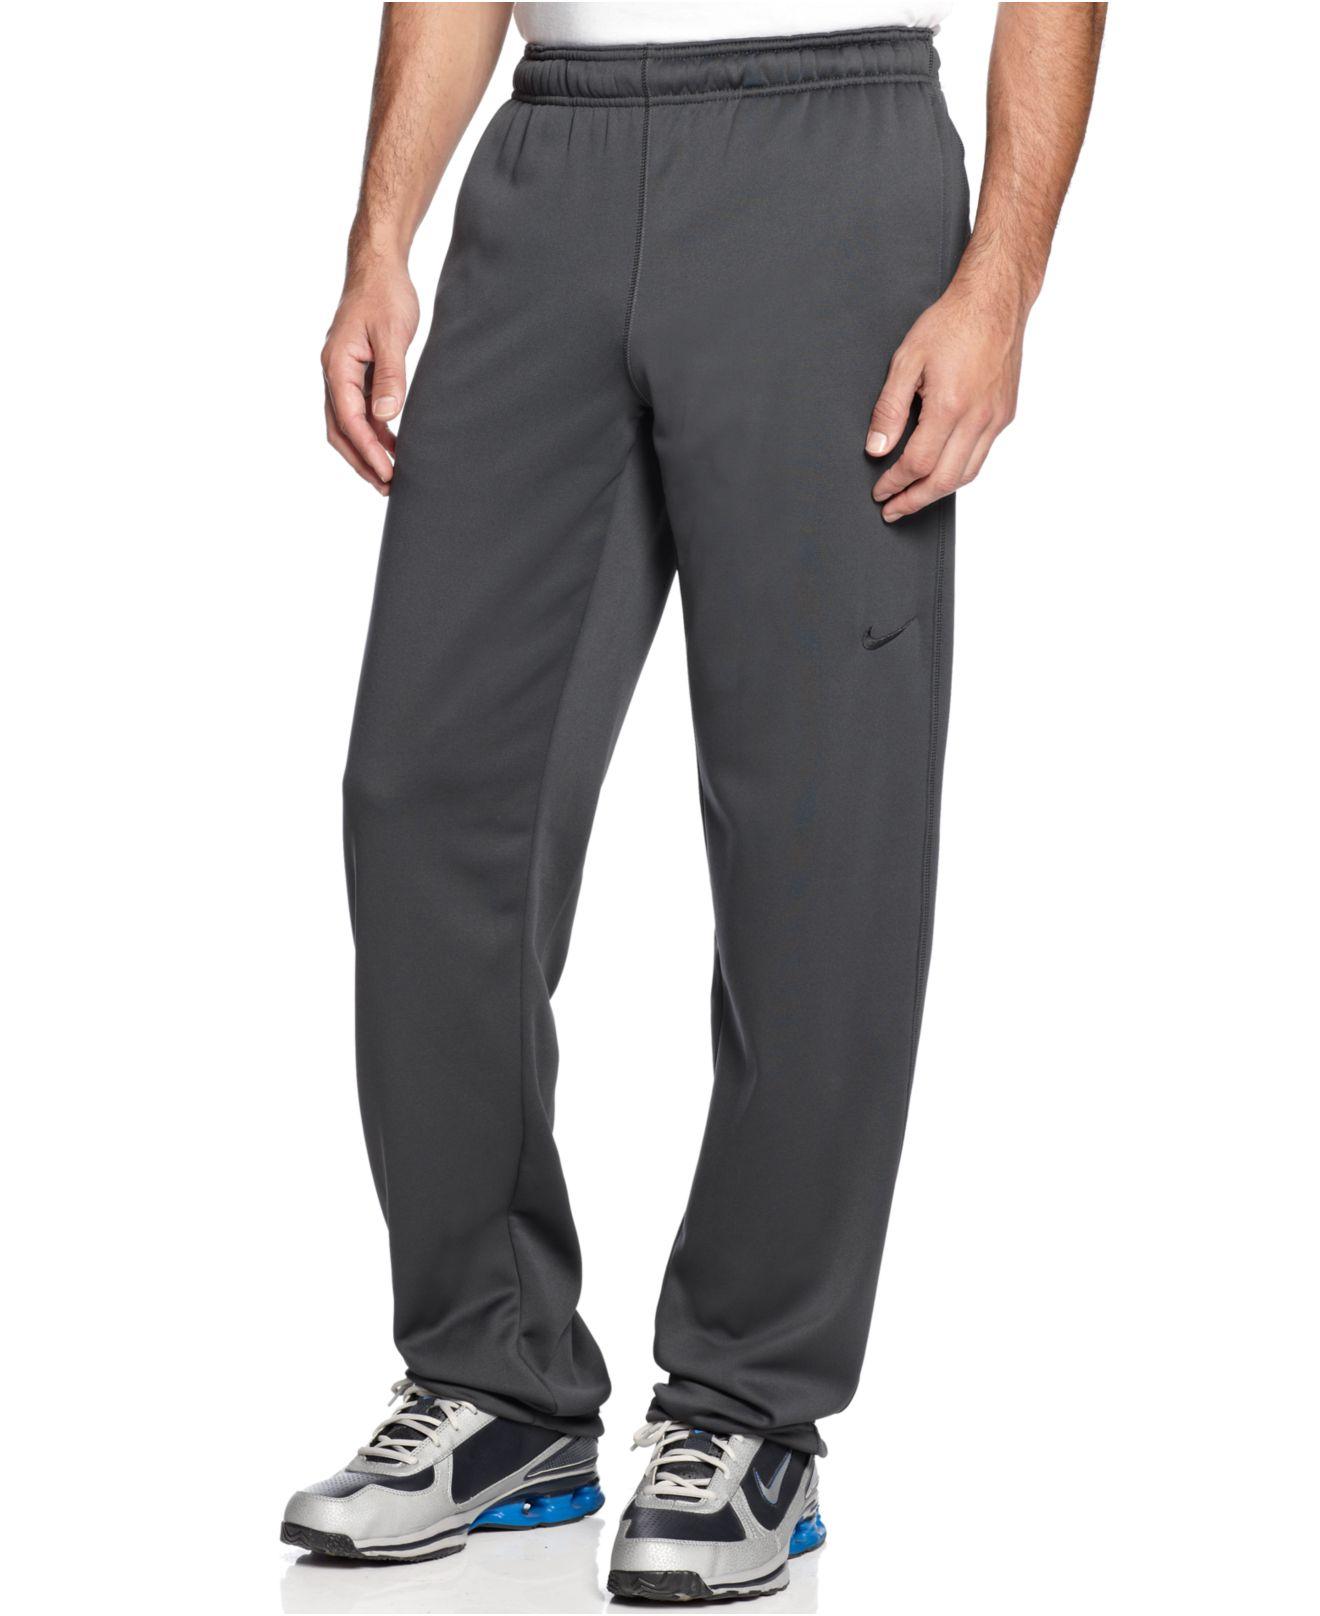 023af8b6d4c1 Nike therma fit ko pants in gray for men lyst jpg 1320x1616 Nike therma fit  pants